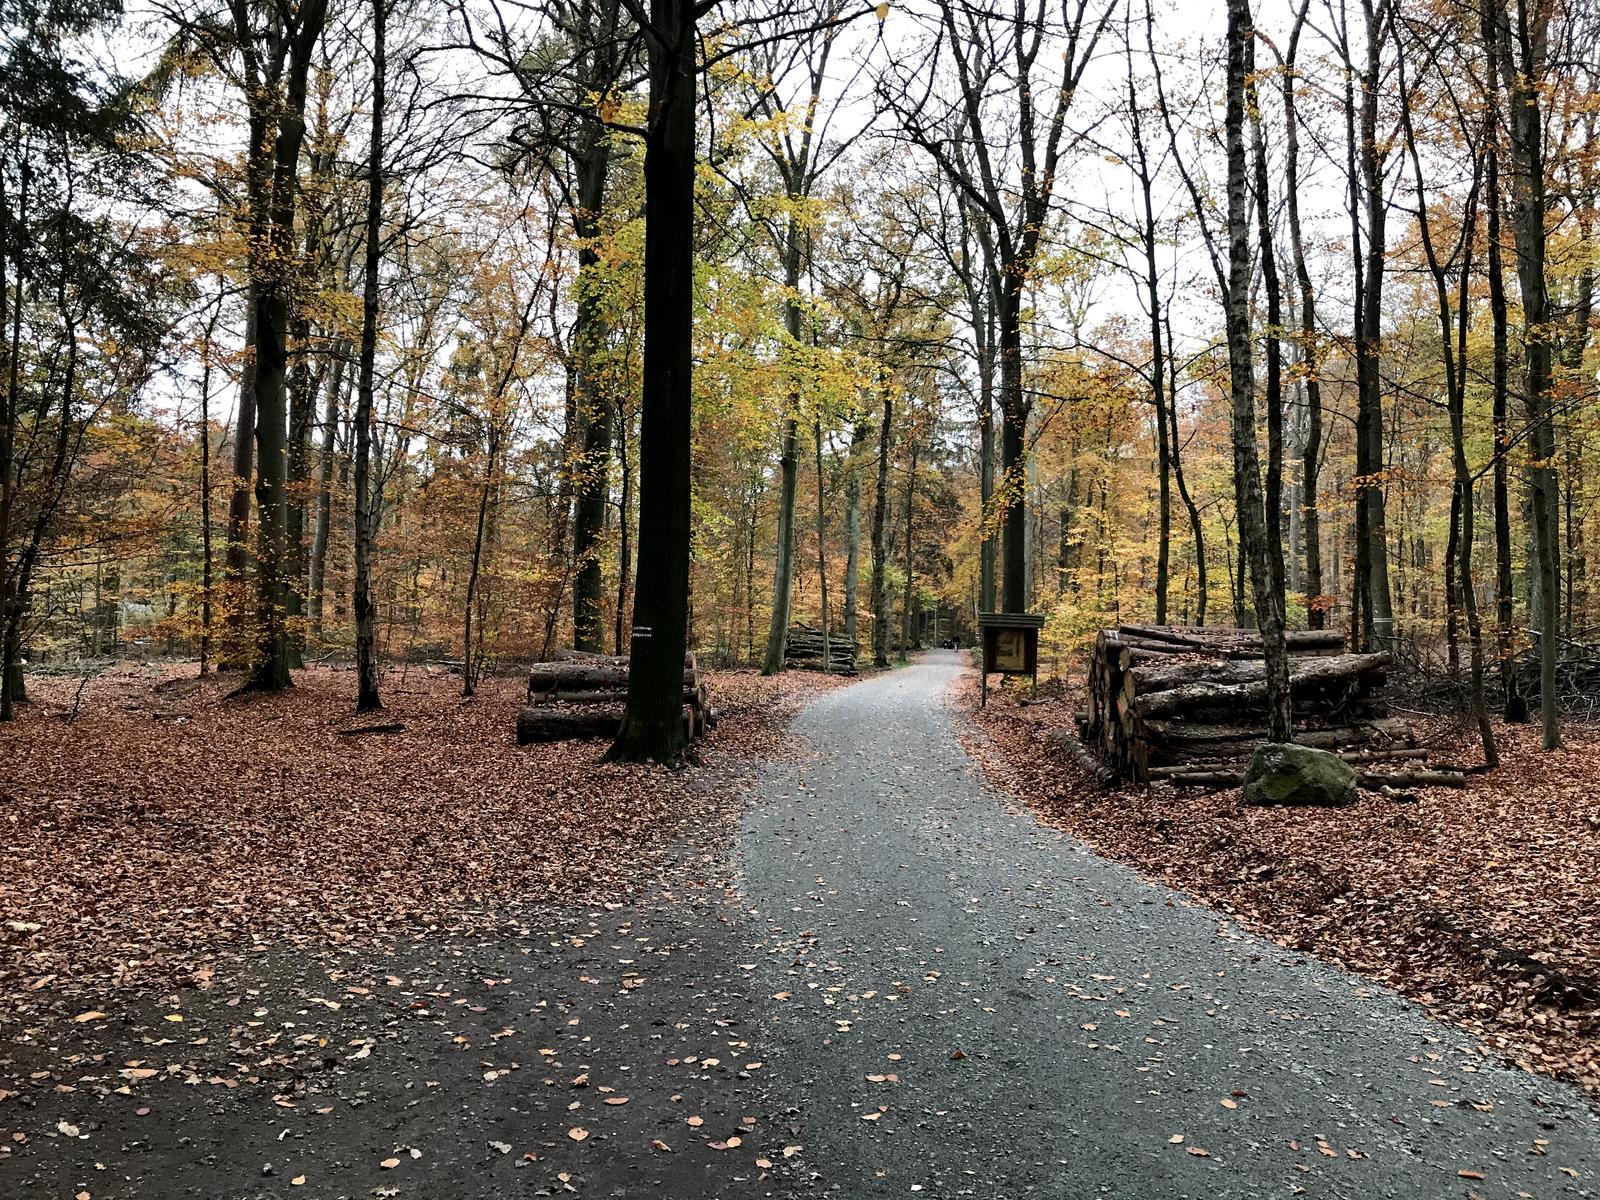 Herbstwald Herbst Hintergrundbild